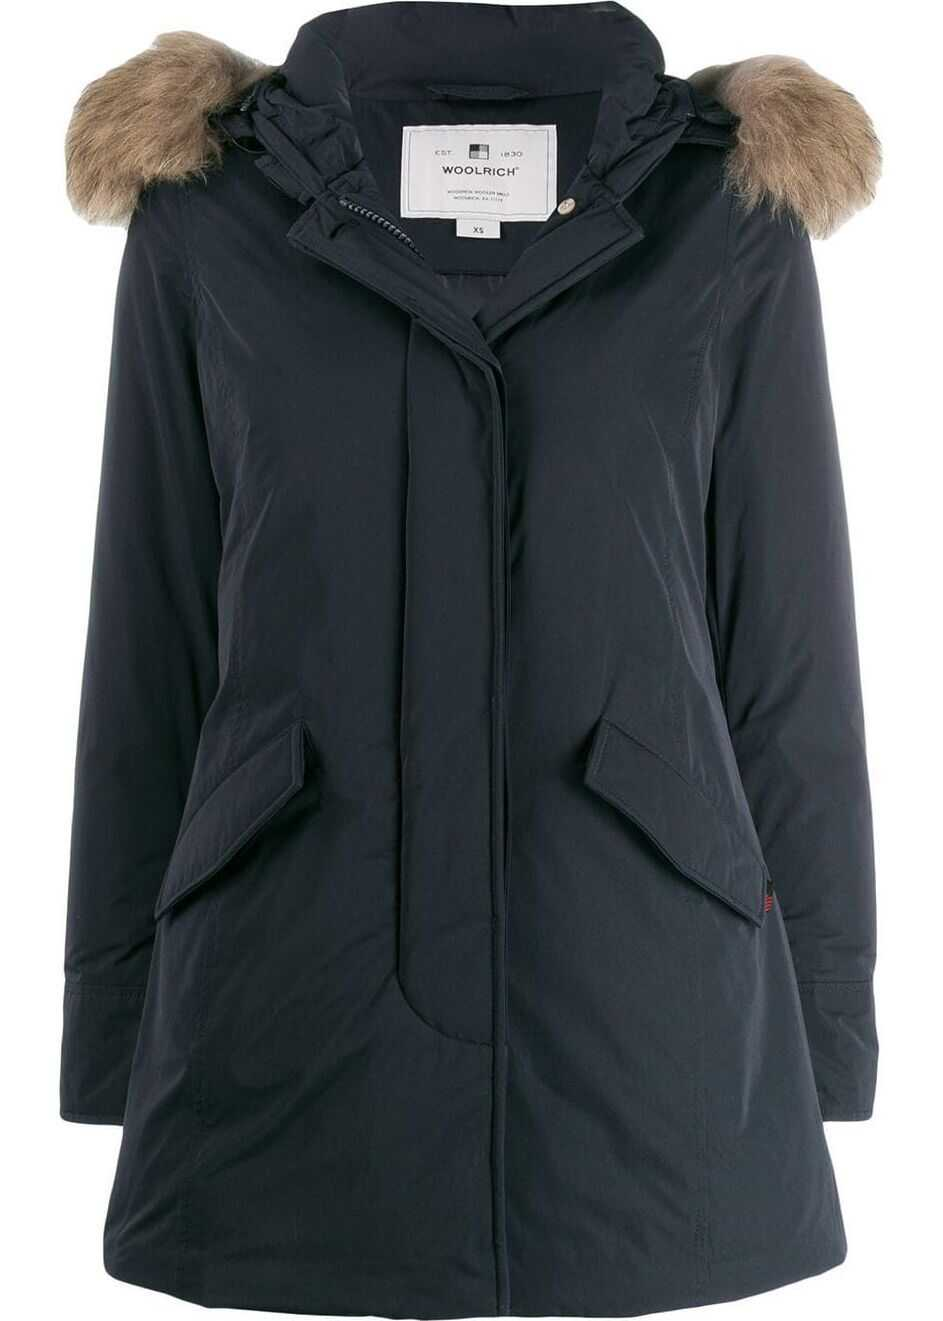 Woolrich Cotton Outerwear Jacket BLUE